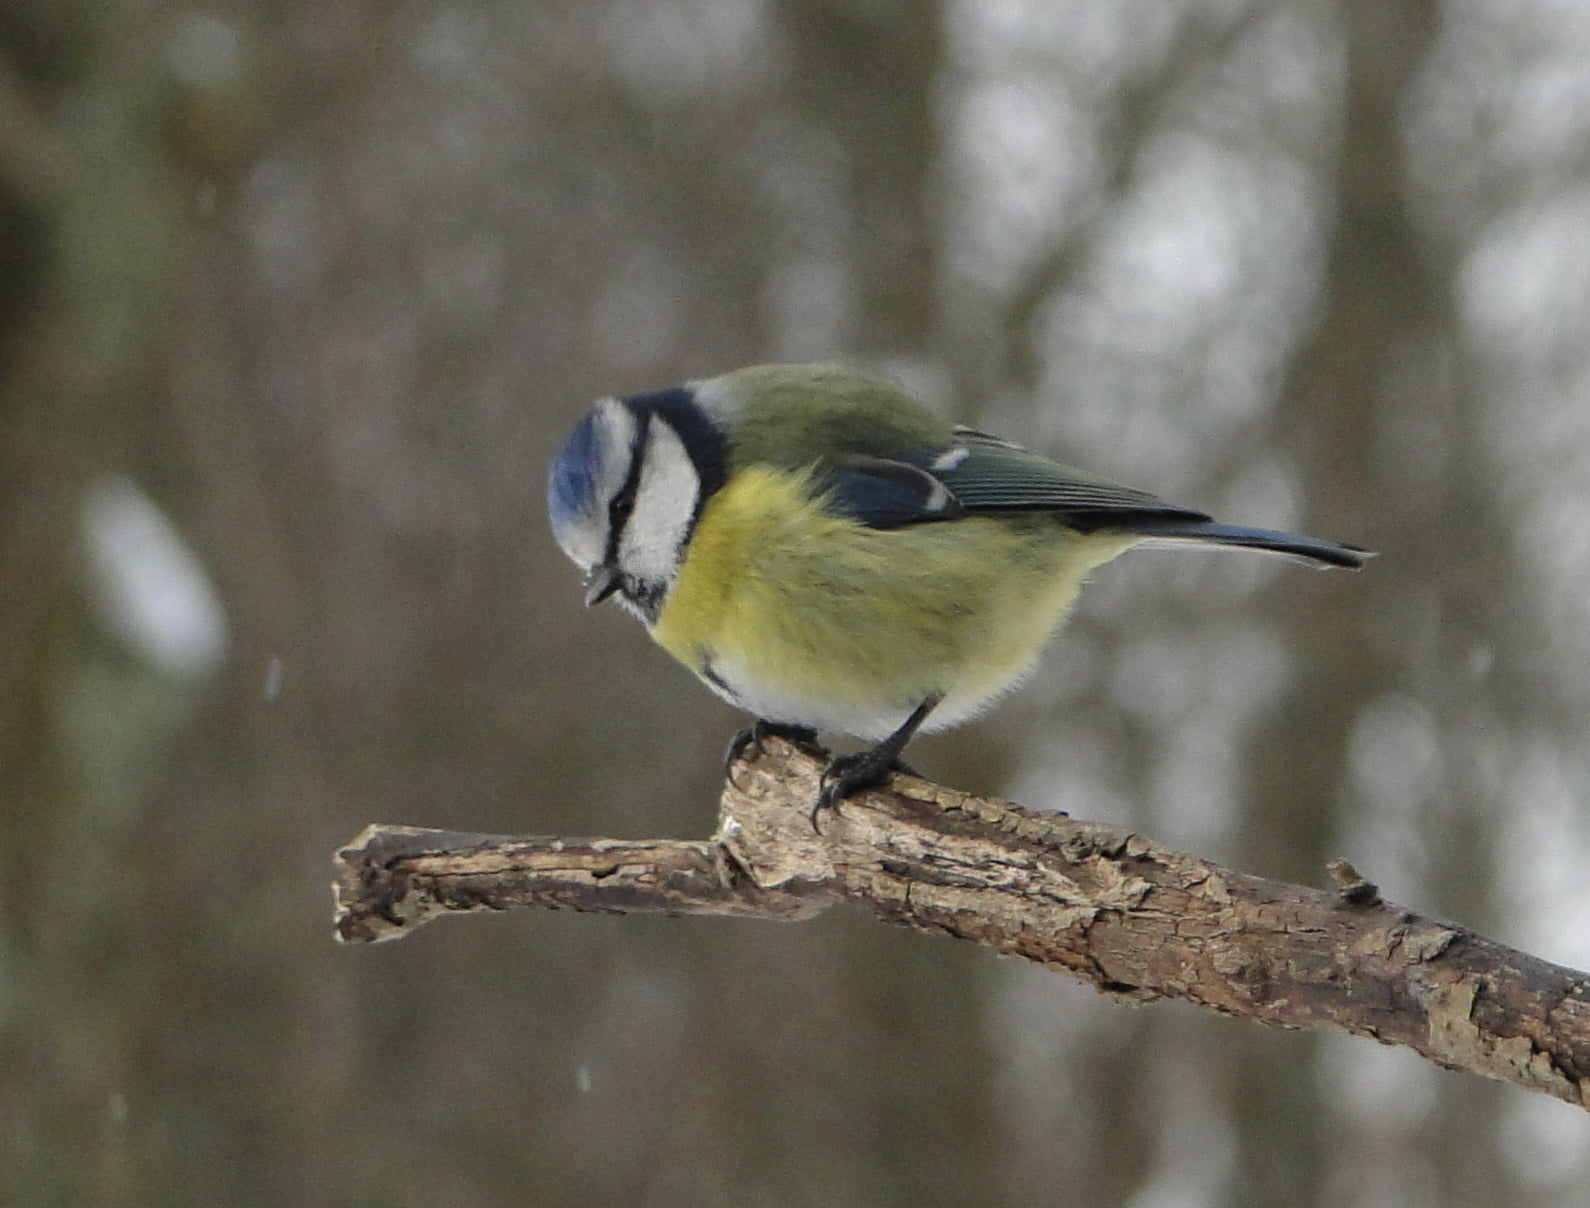 Nasi zimowi ptasi przyjaciele 2